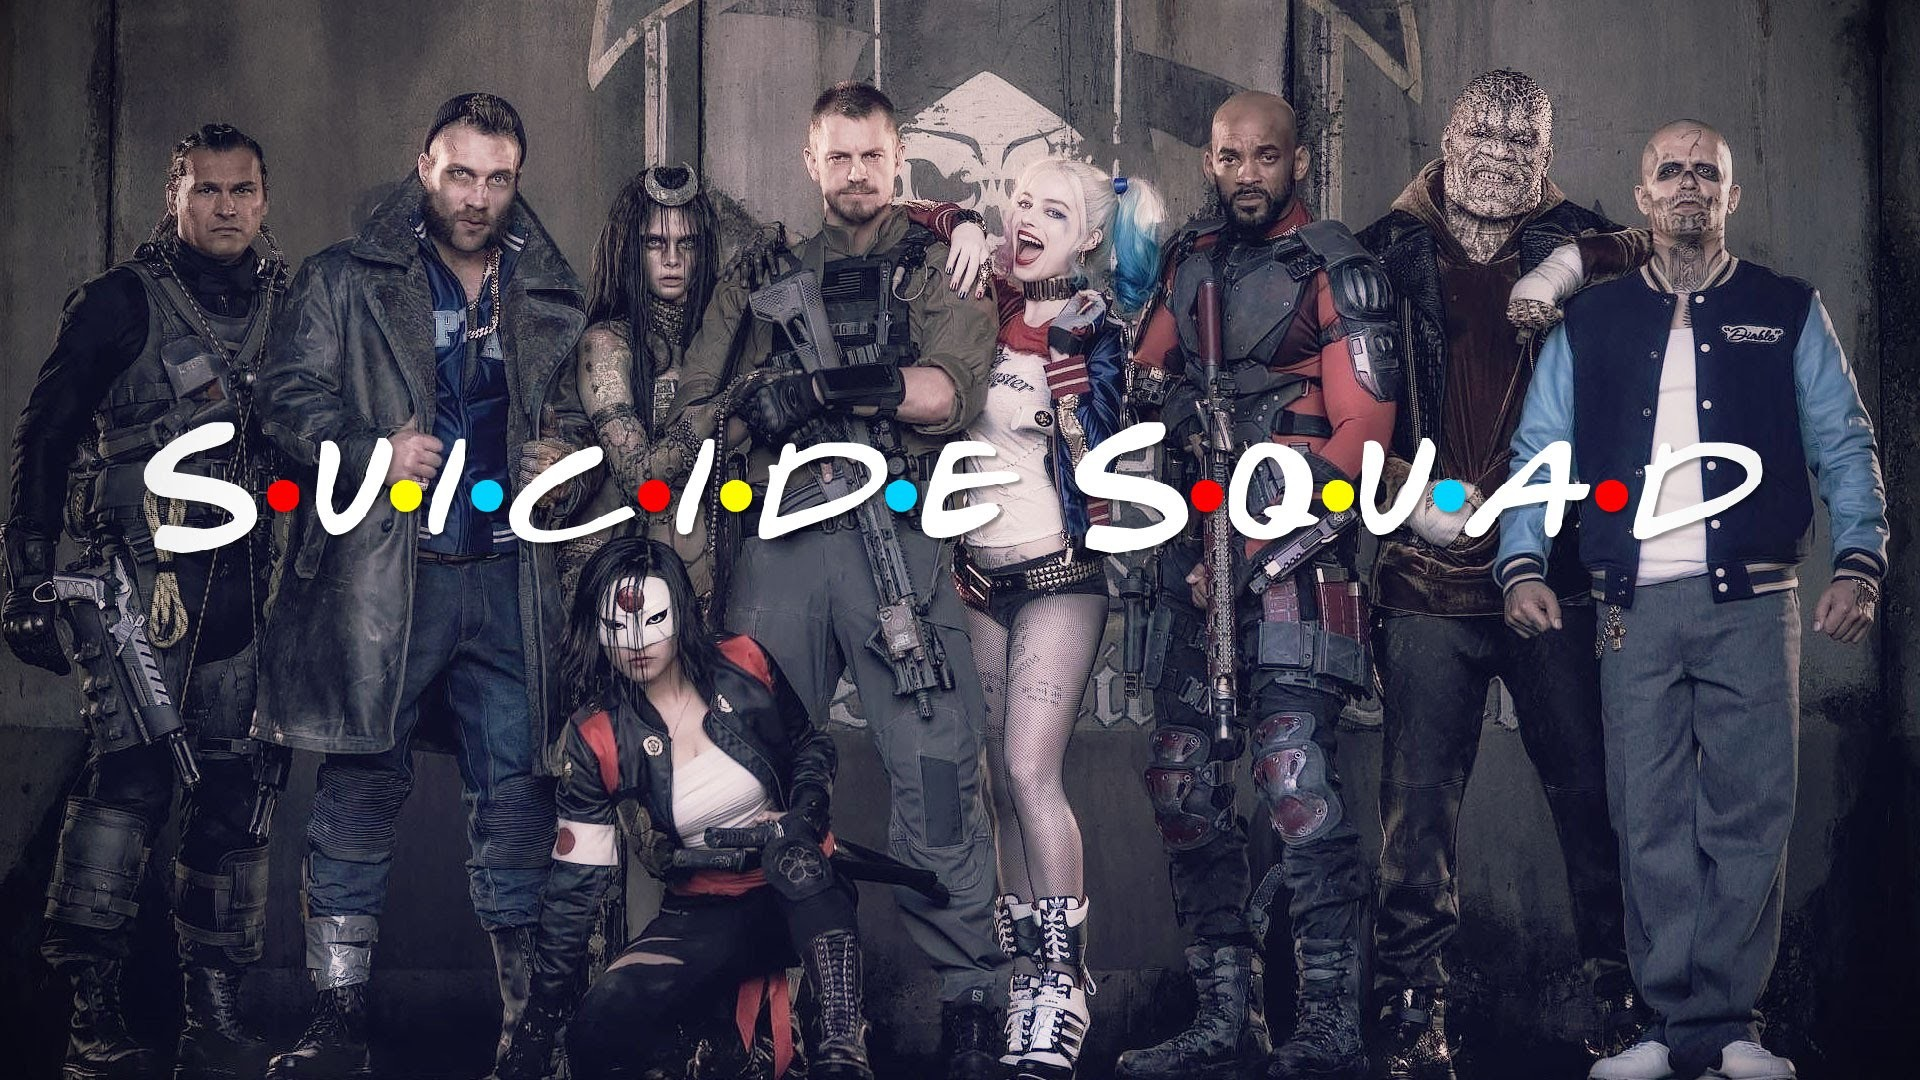 … Suicide Squad, art 2016 HD wallpaper thumb … Fictional Harley Quinn  Suicide …